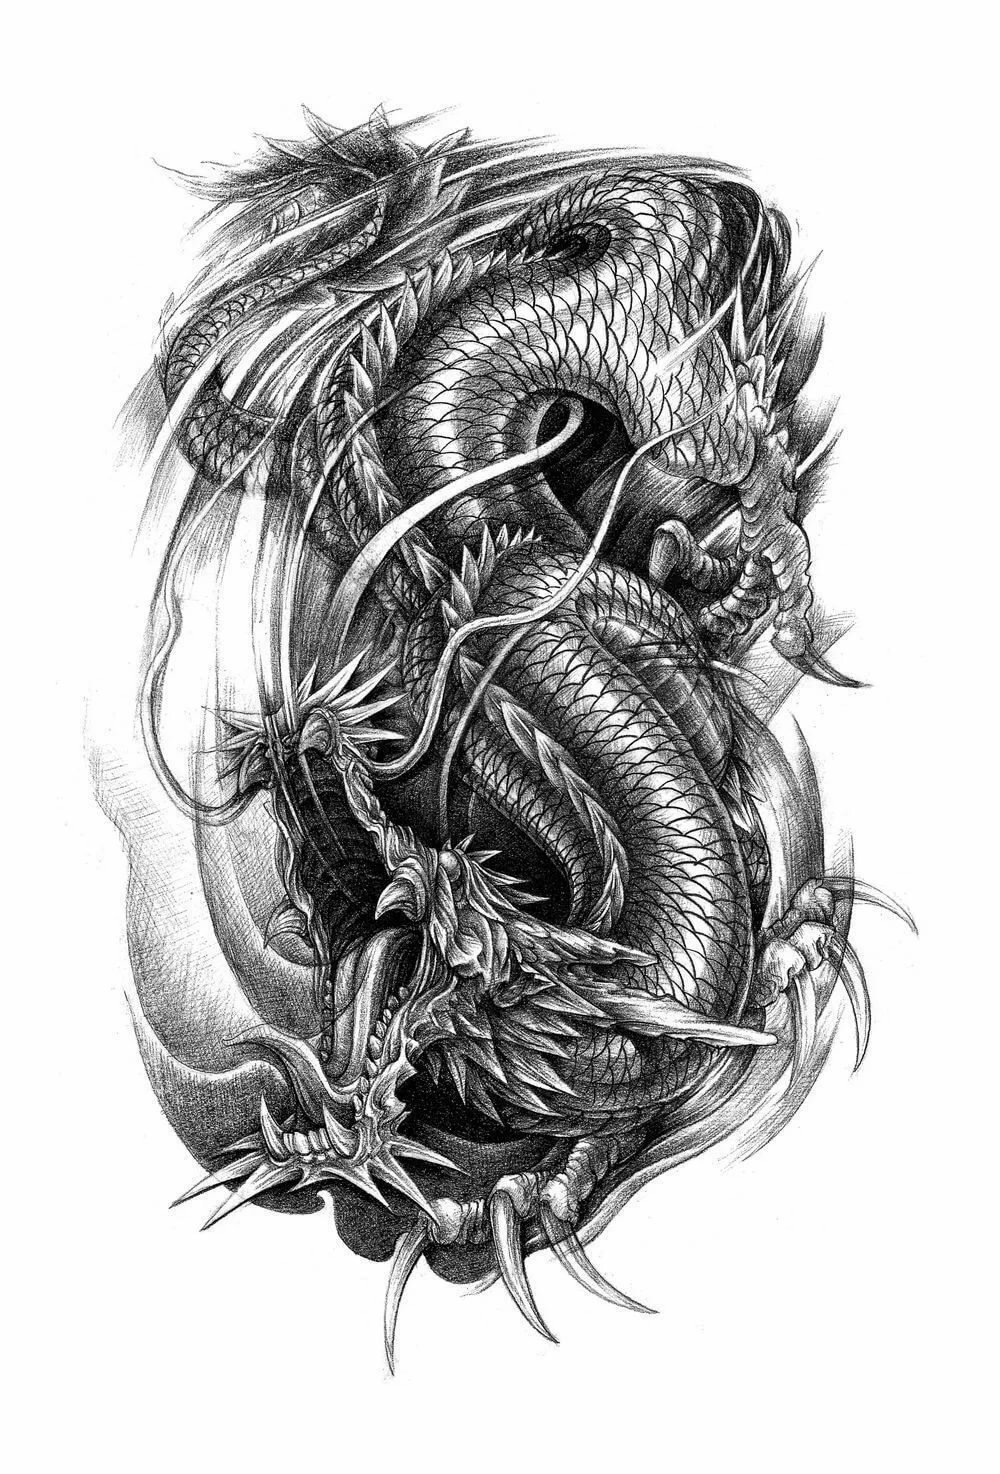 картинки для тату драконов для мужчин обусловлено тем, что